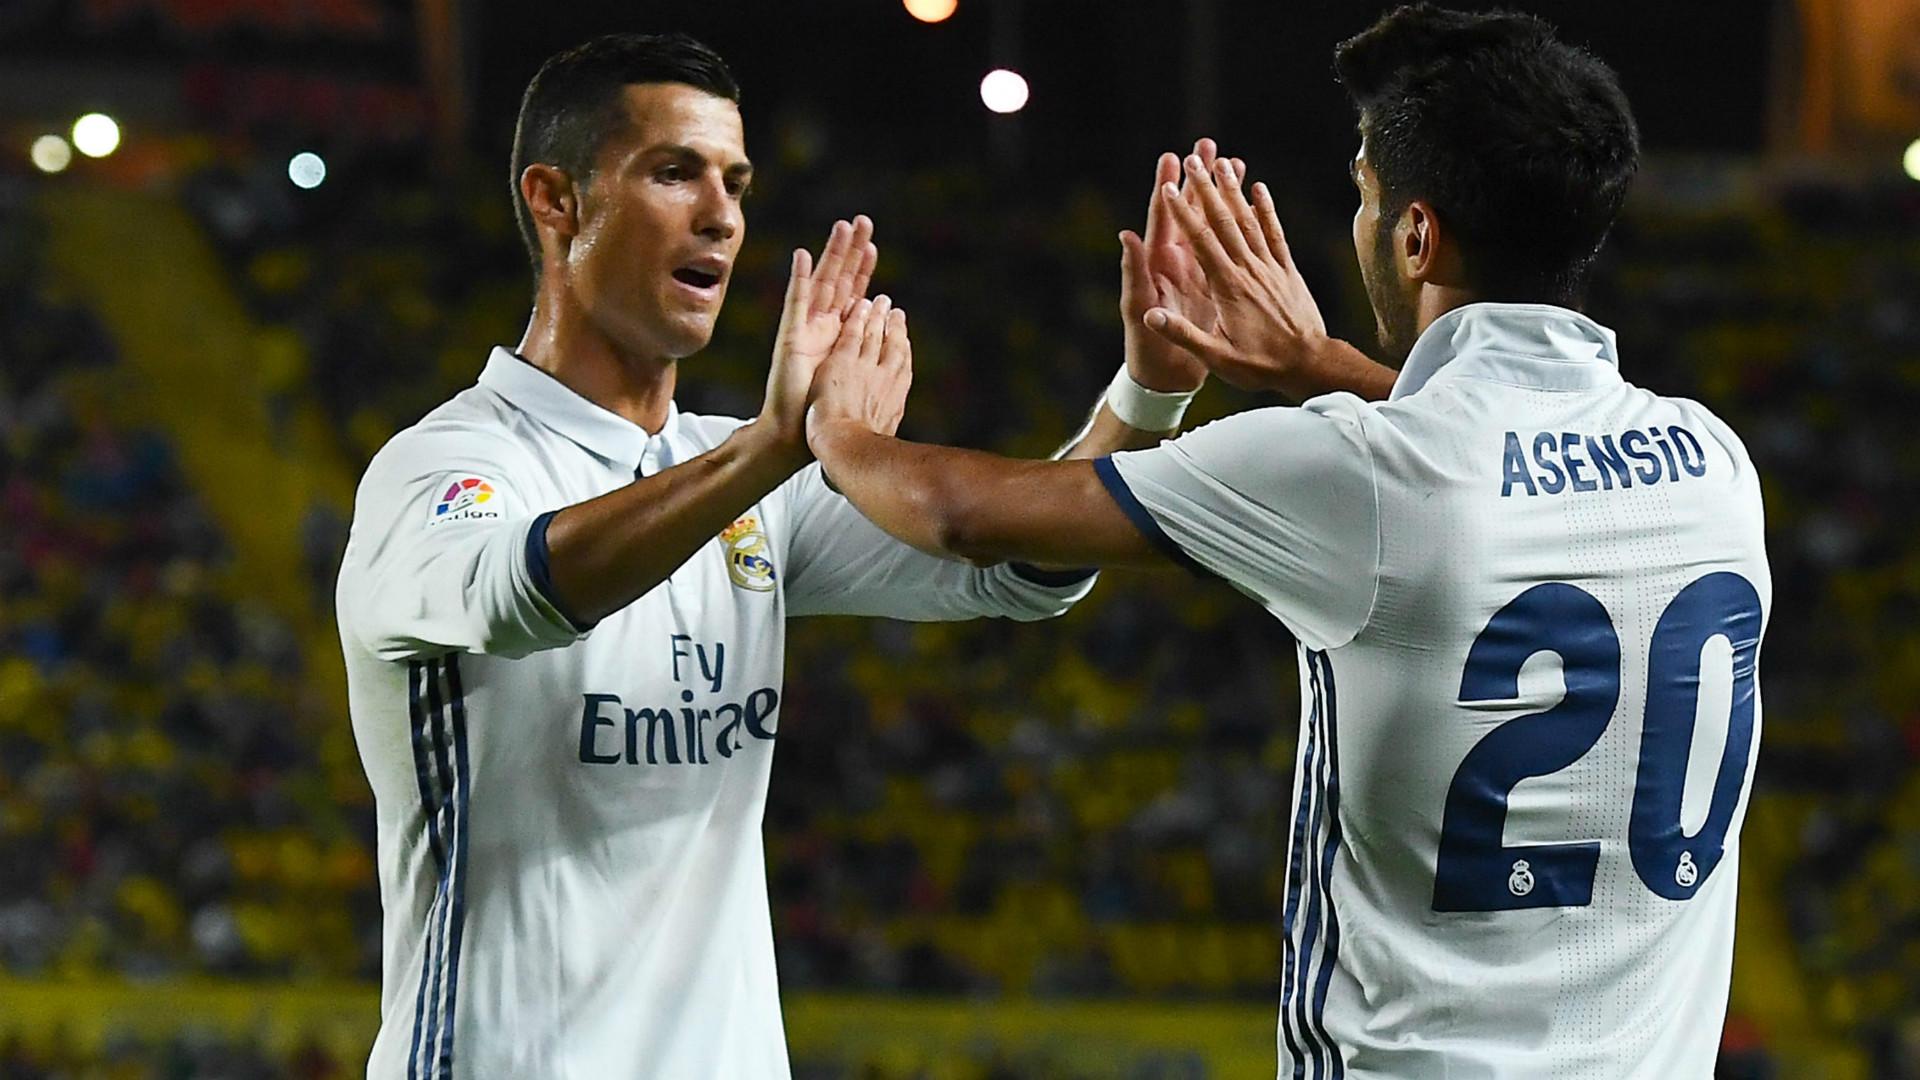 Cristiano Ronaldo Marco Asensio Las Palmas Real Madrid LaLiga